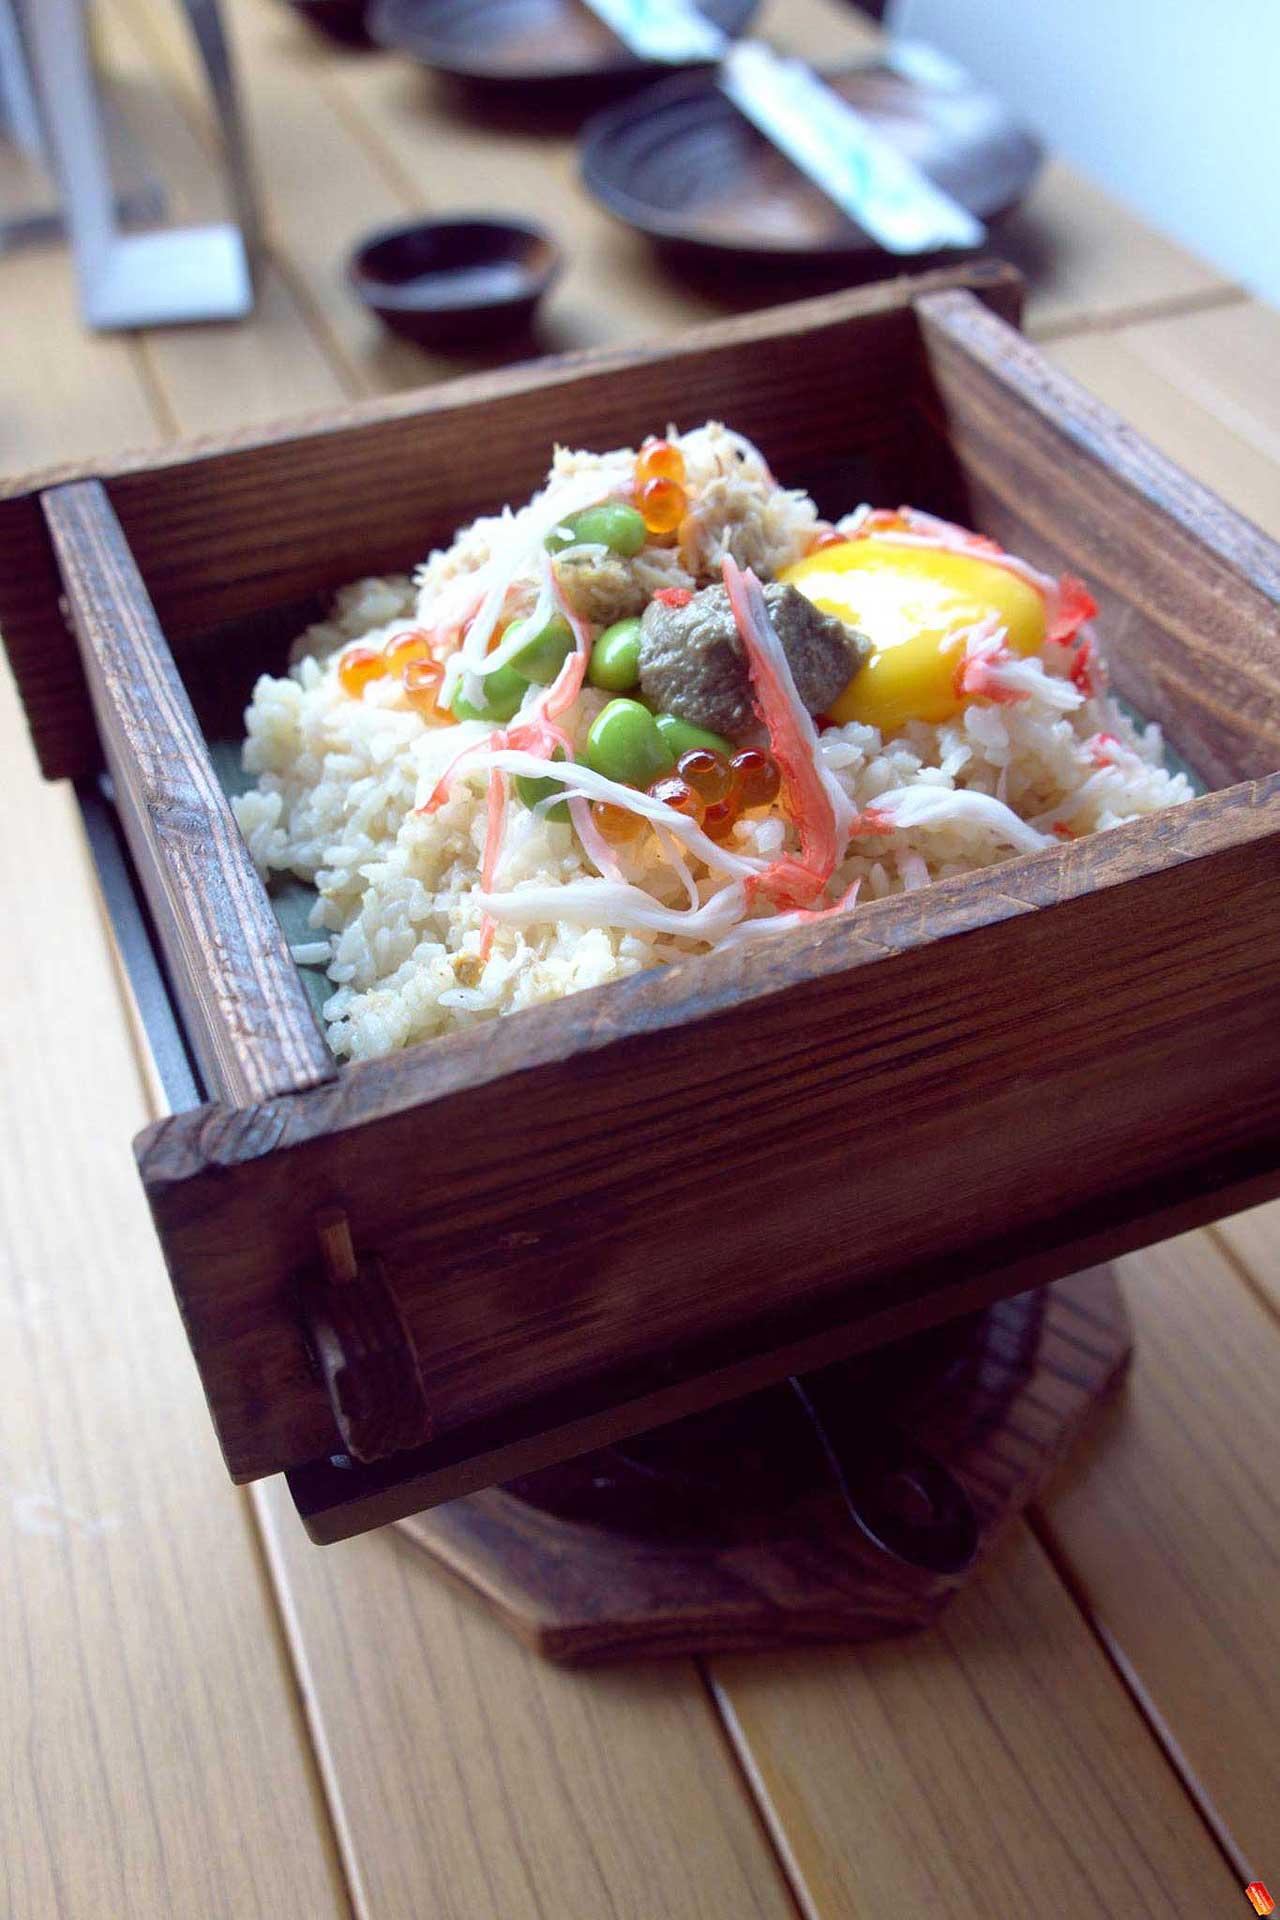 Yamaguchi Fish Market